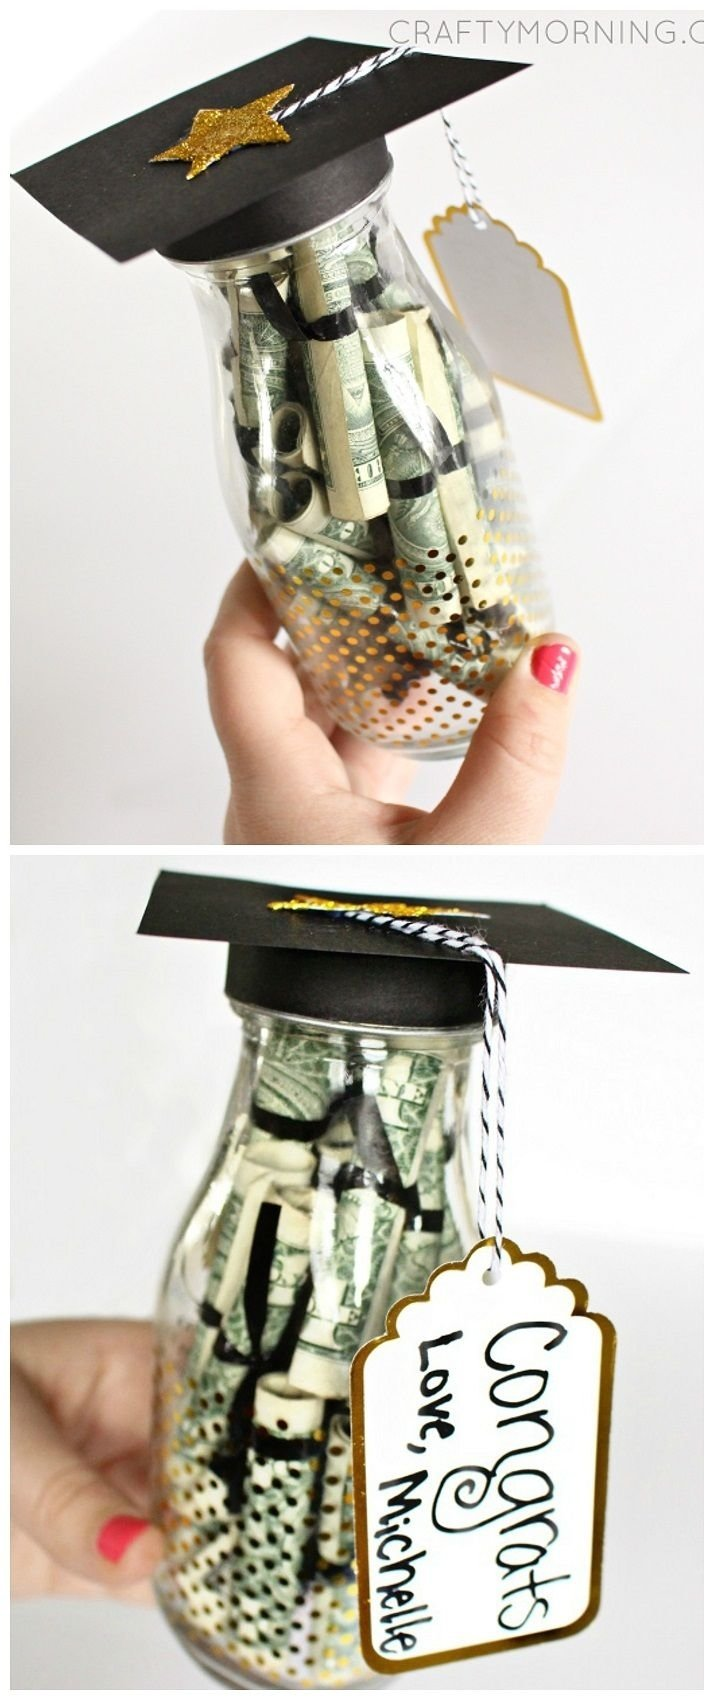 10 Ideal Graduation Gift Ideas For High School Seniors graduation glass bottle gift dollar bill diplomas perfect for 19 2020